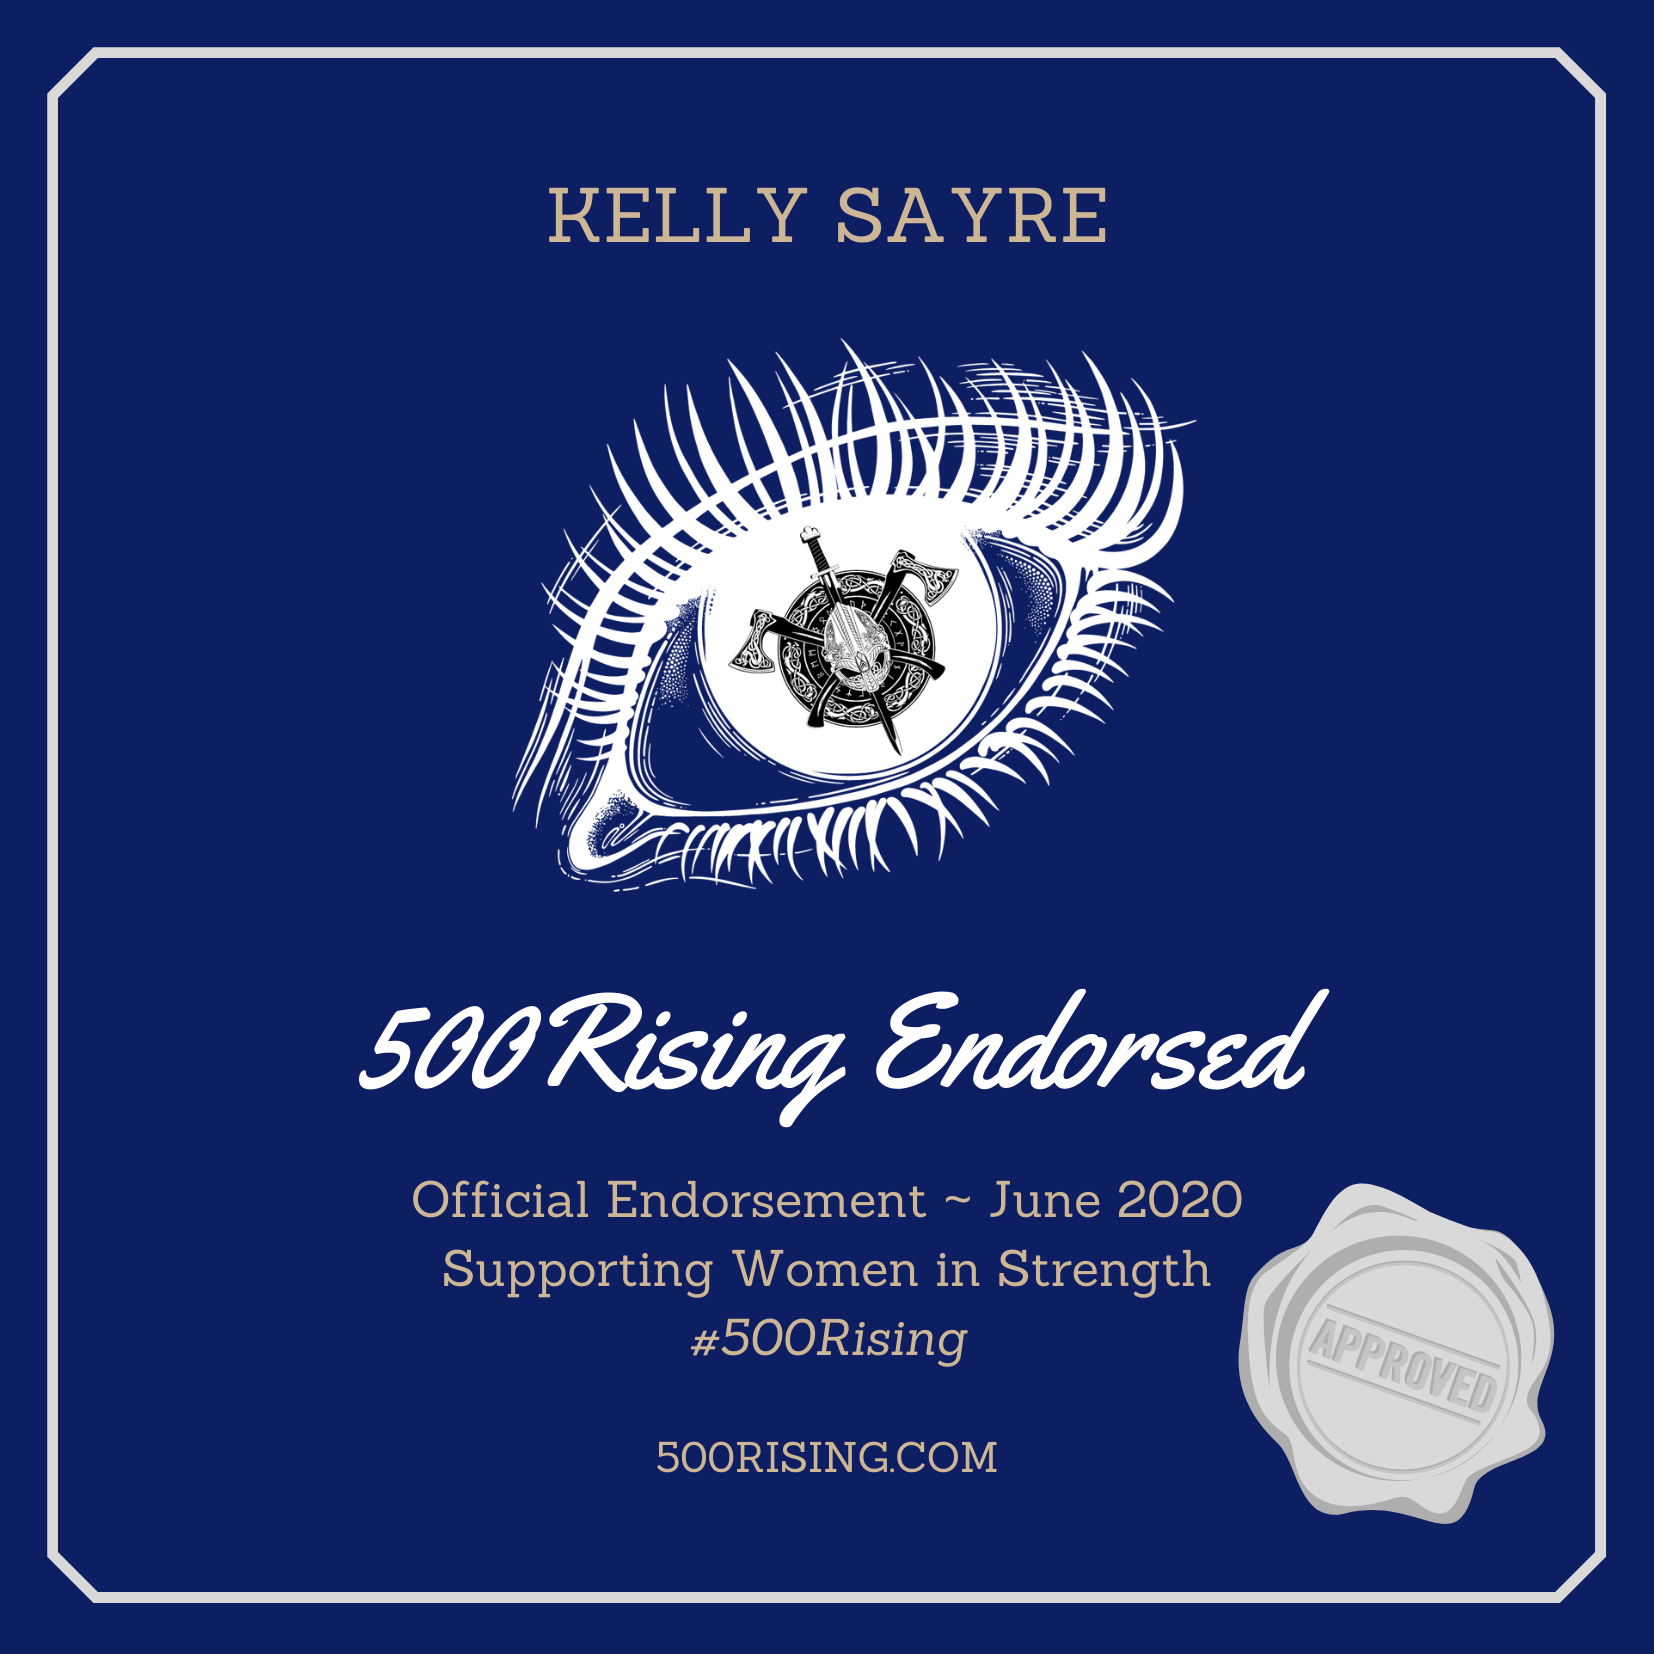 500 Rising endorsement seal for Kelly Sayre